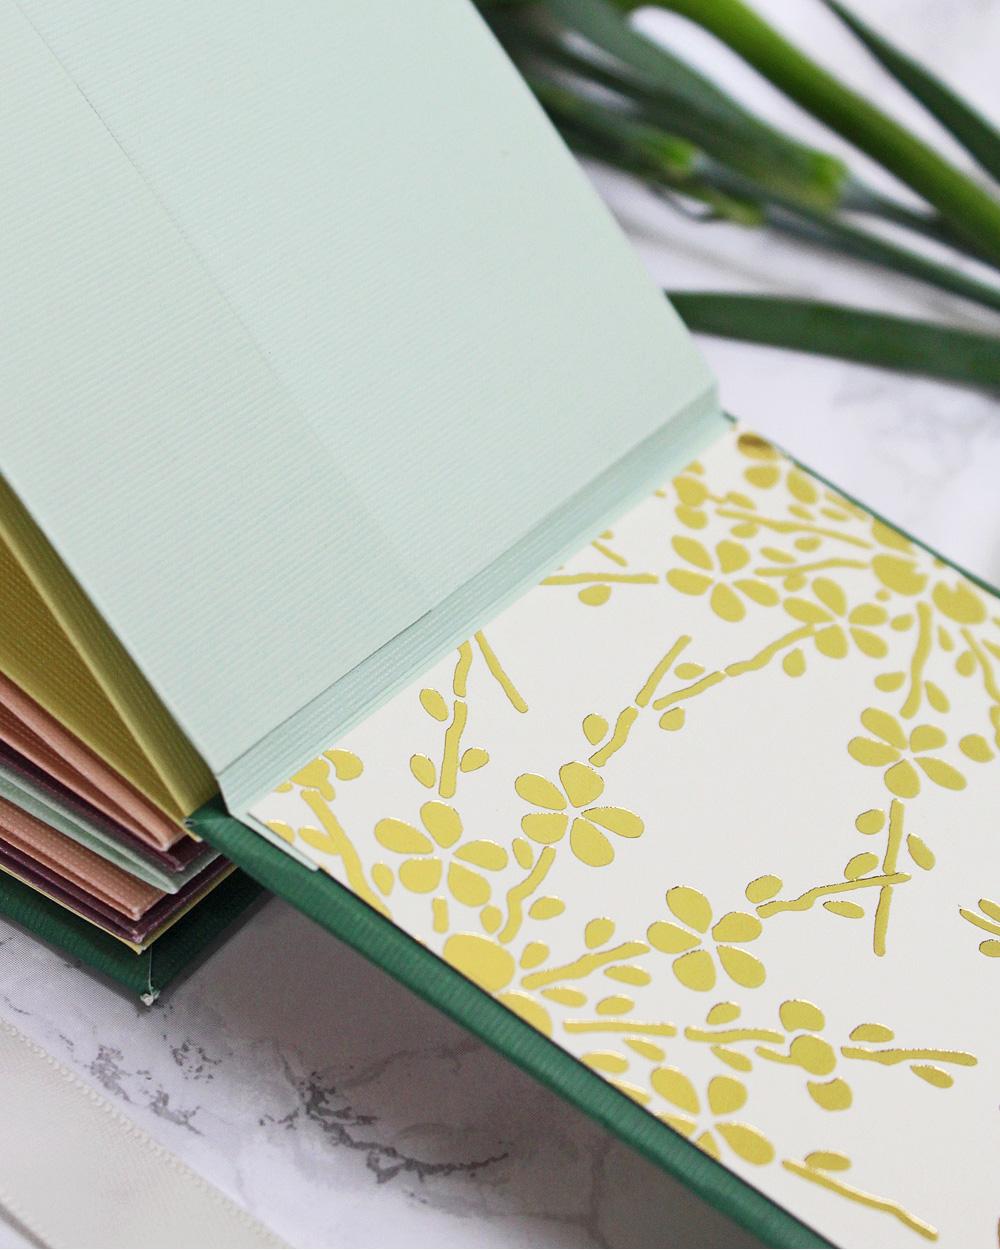 diy-spring-wedding-guest-book-7-0416.jpg